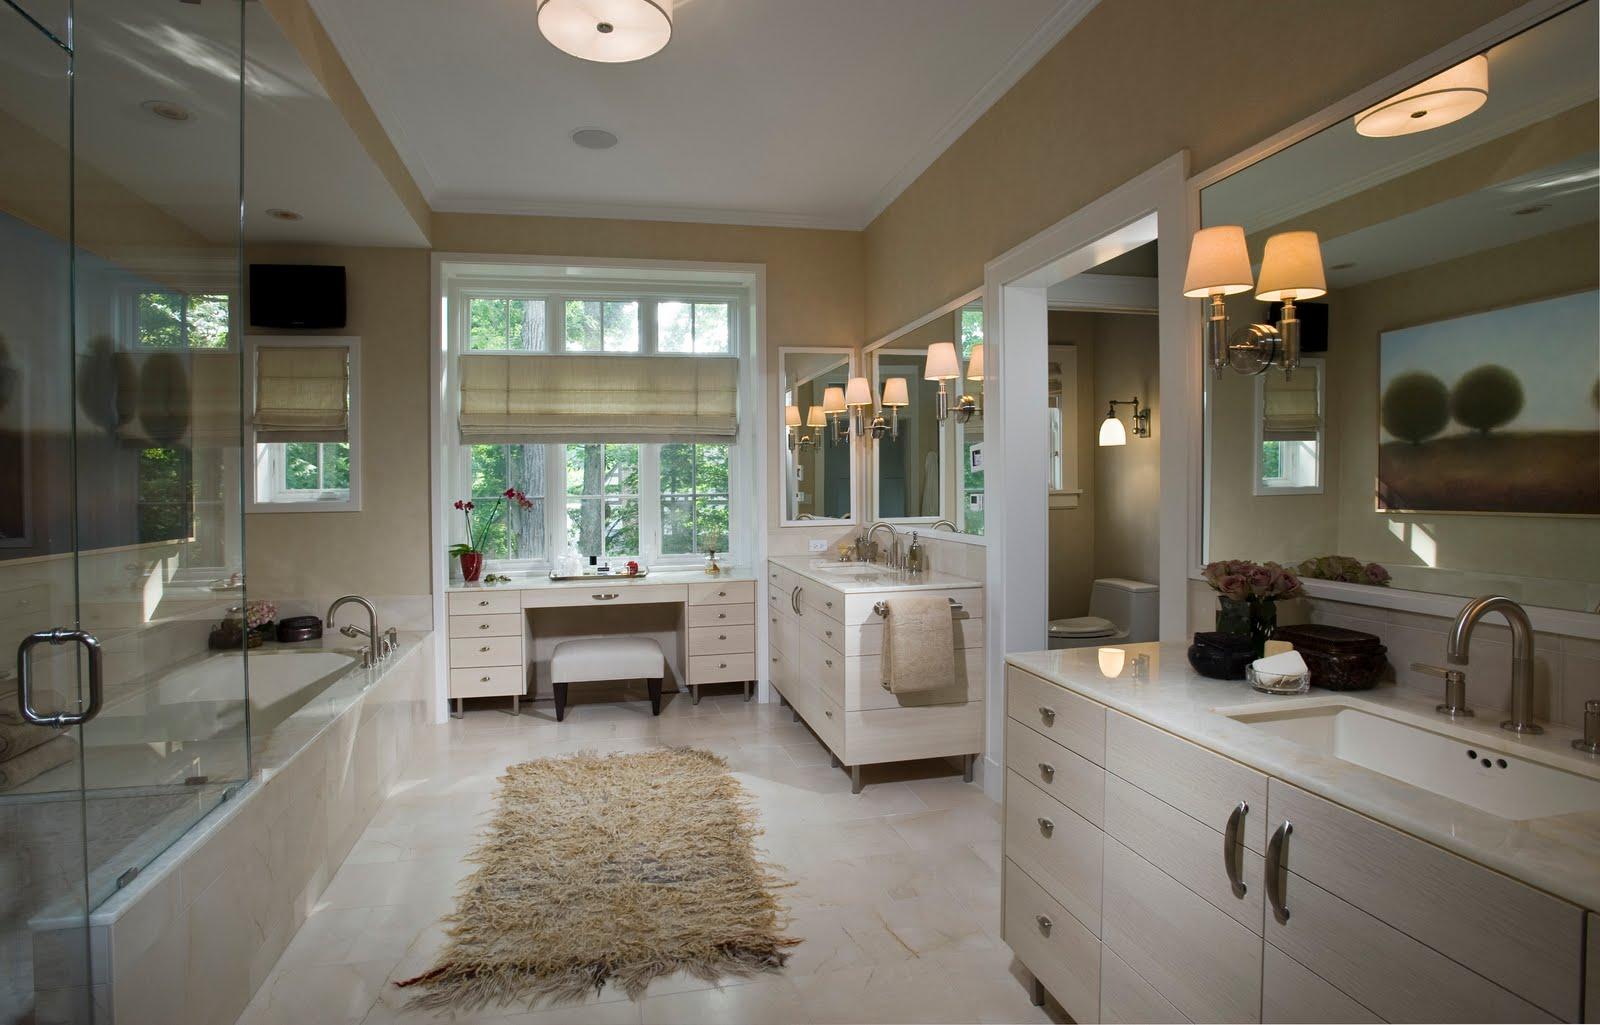 17 Interesting Bathroom Designs  Architecture